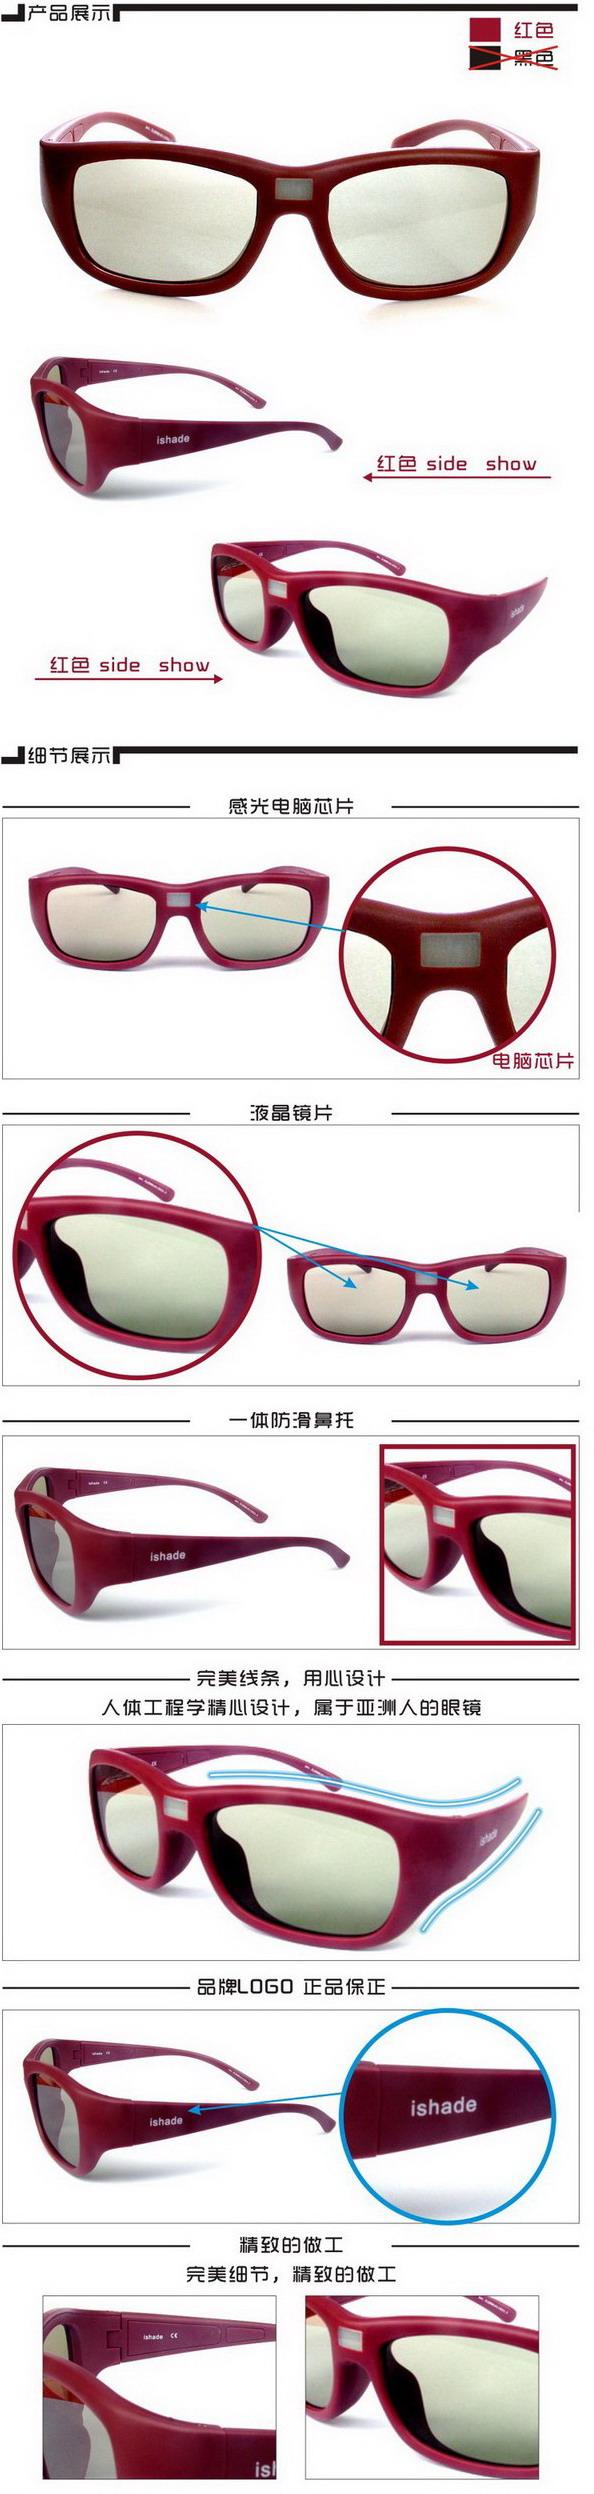 紅isd001(1)00 - 副本.jpg